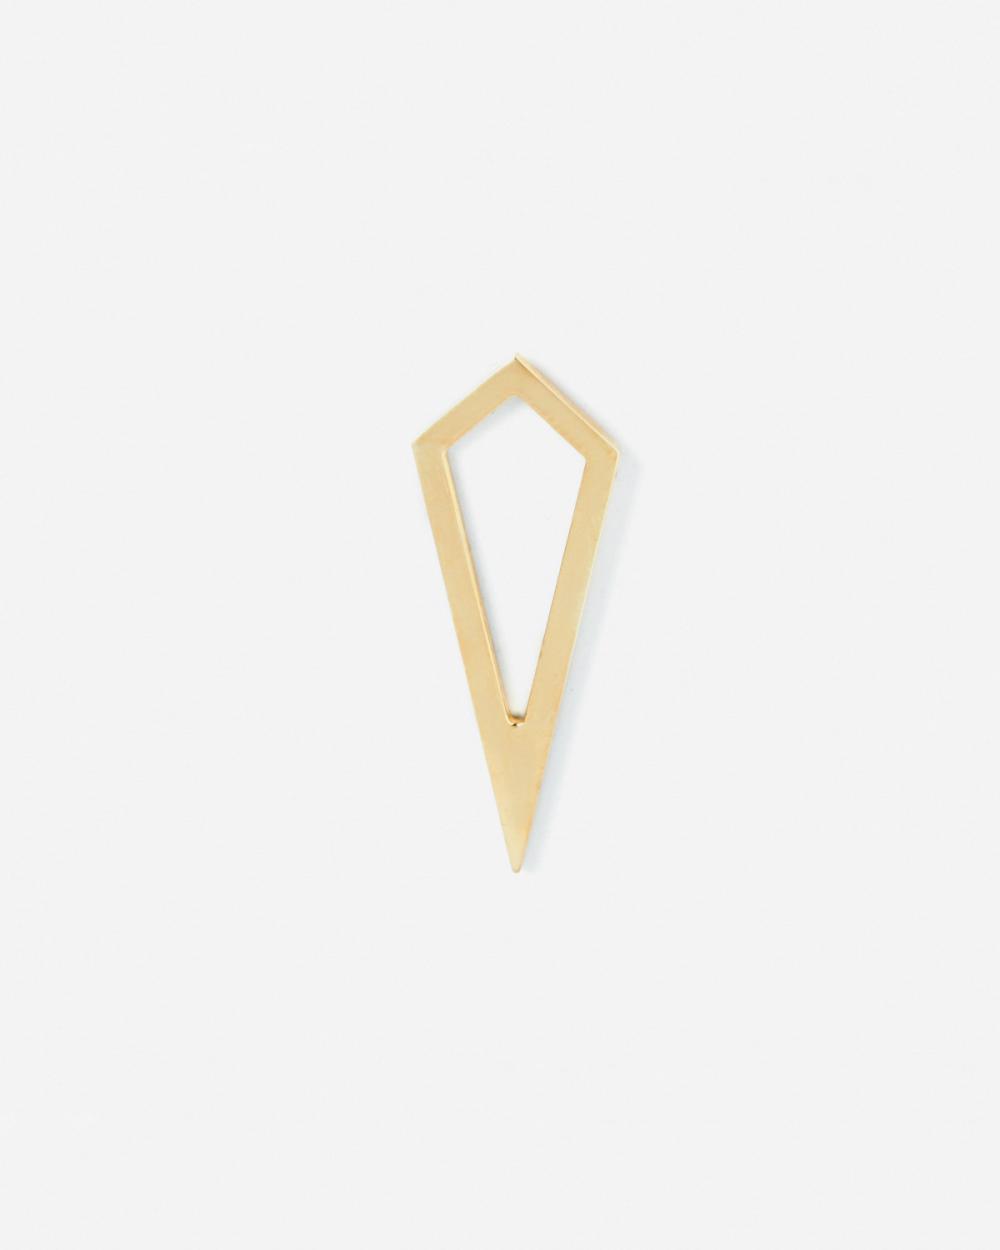 Earrings YELLOW GOLD PRISM PROFILE SINGLE EARRING NOVE25